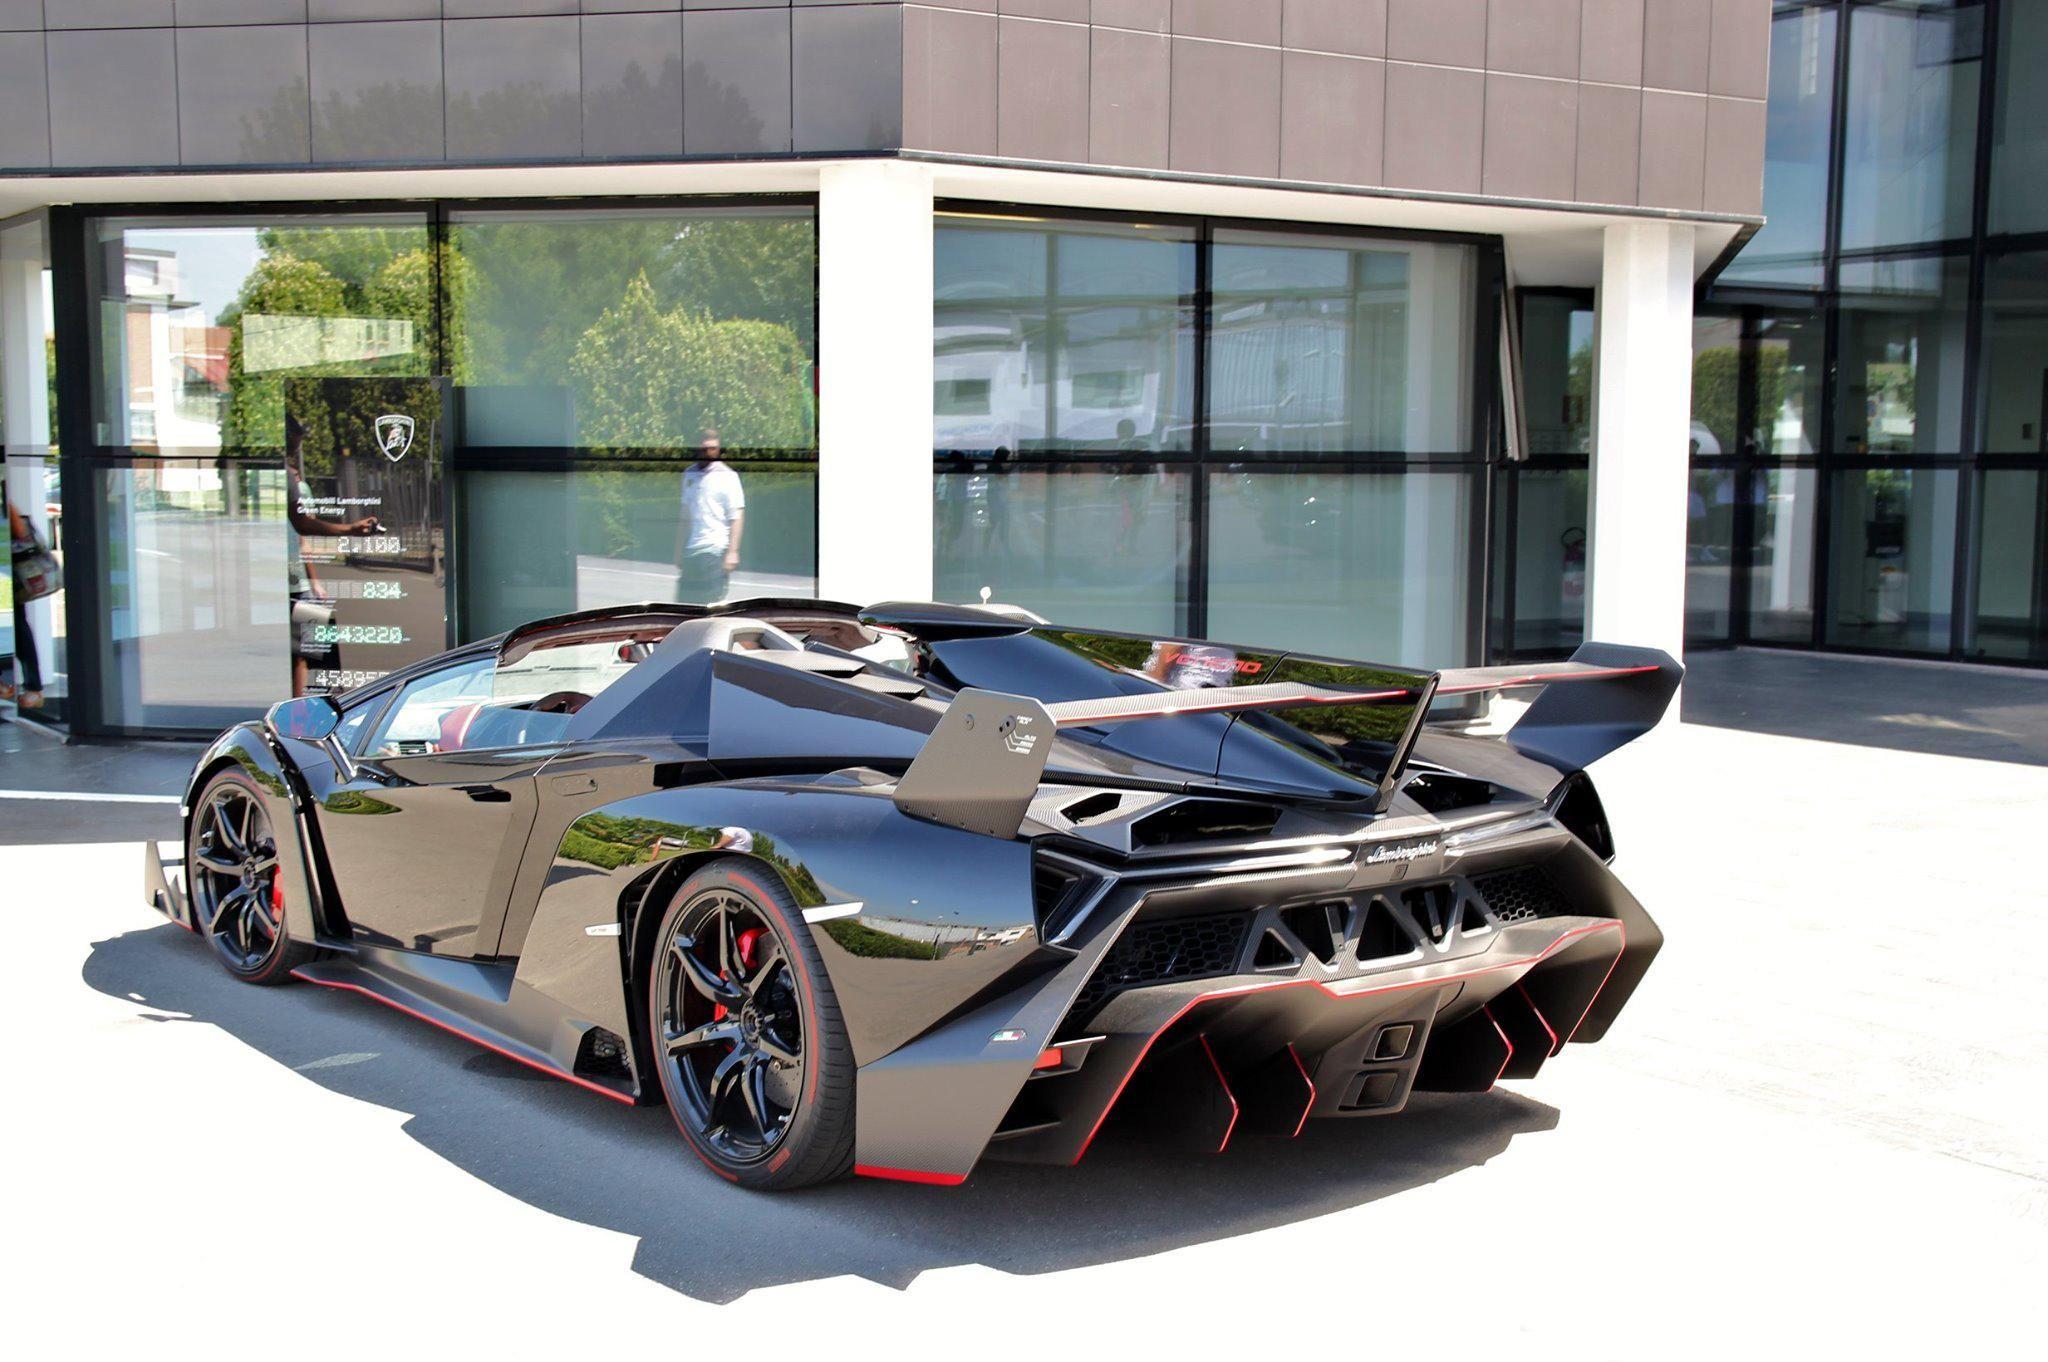 Veneno Roadster 4.4 Million Luxury Supercar